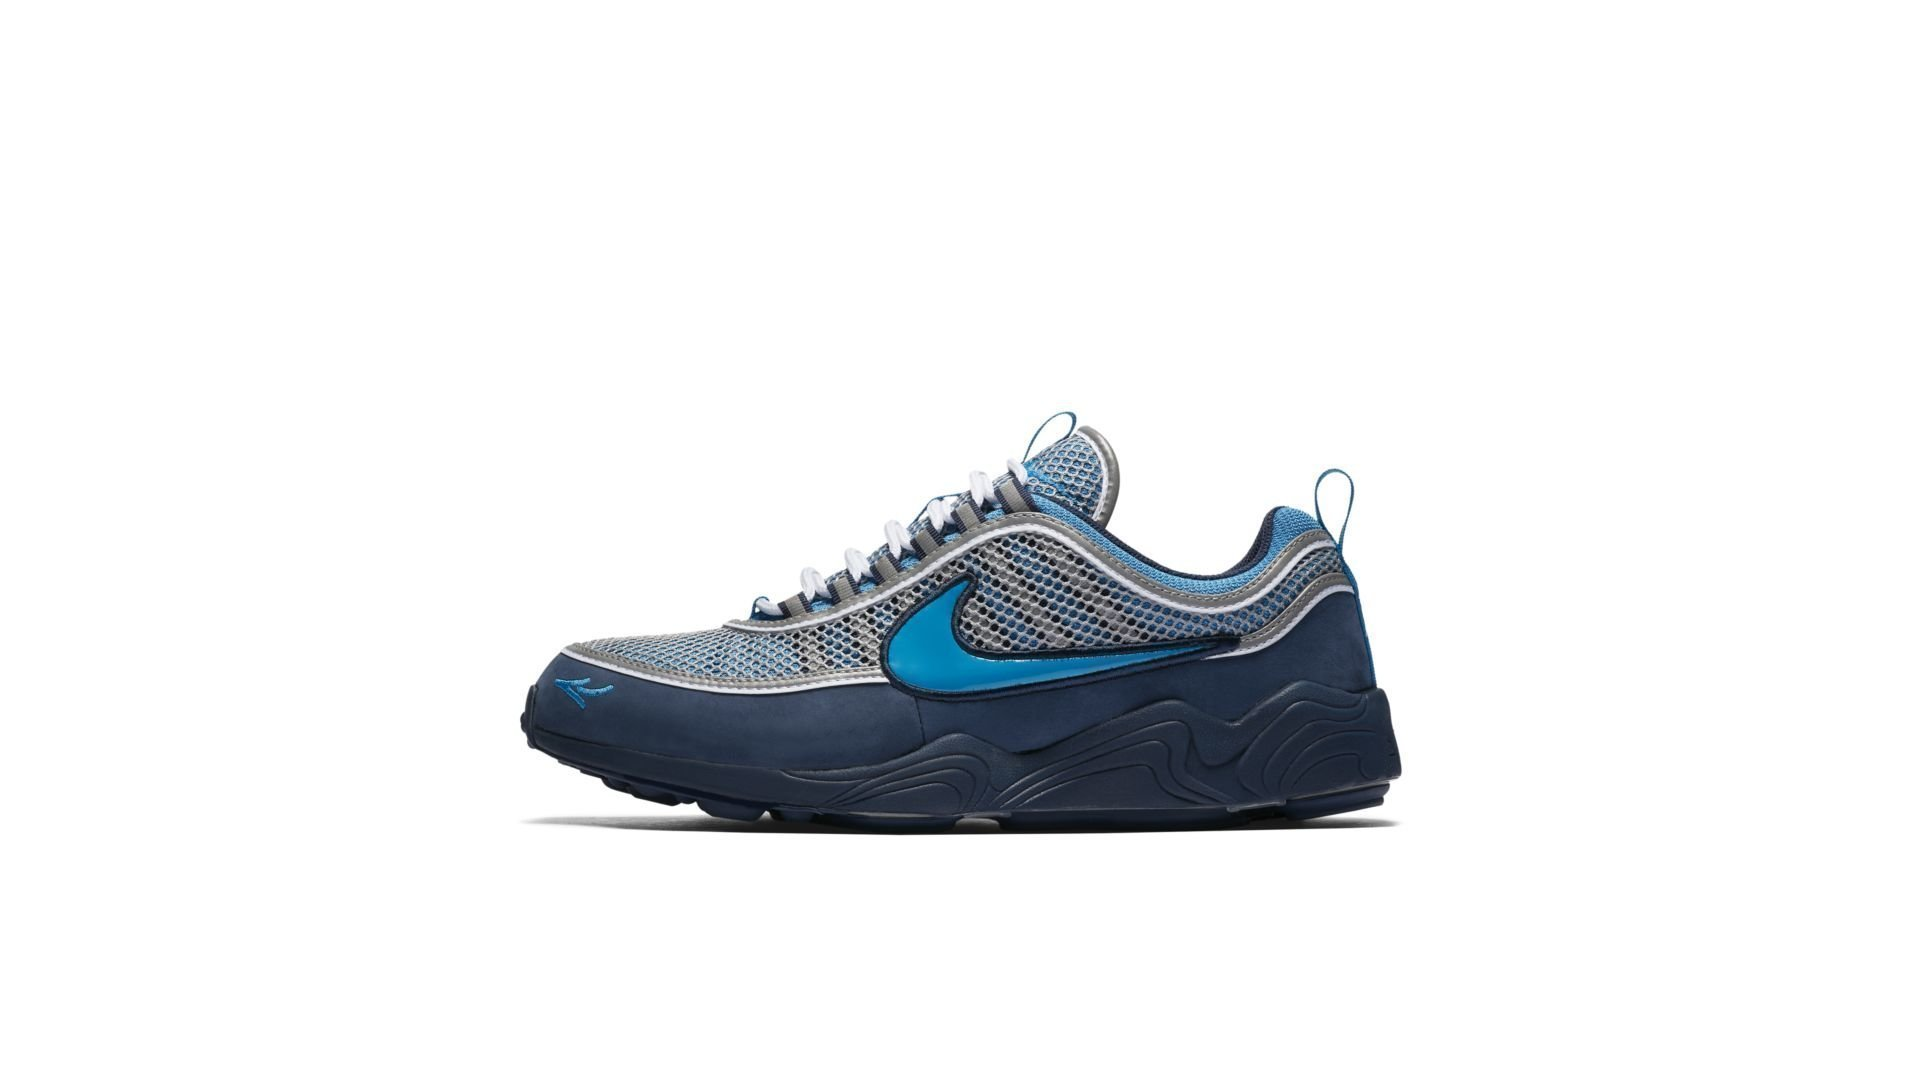 Stash x Nike Spiridon Nozzle Cap Blue (AH7973-400)